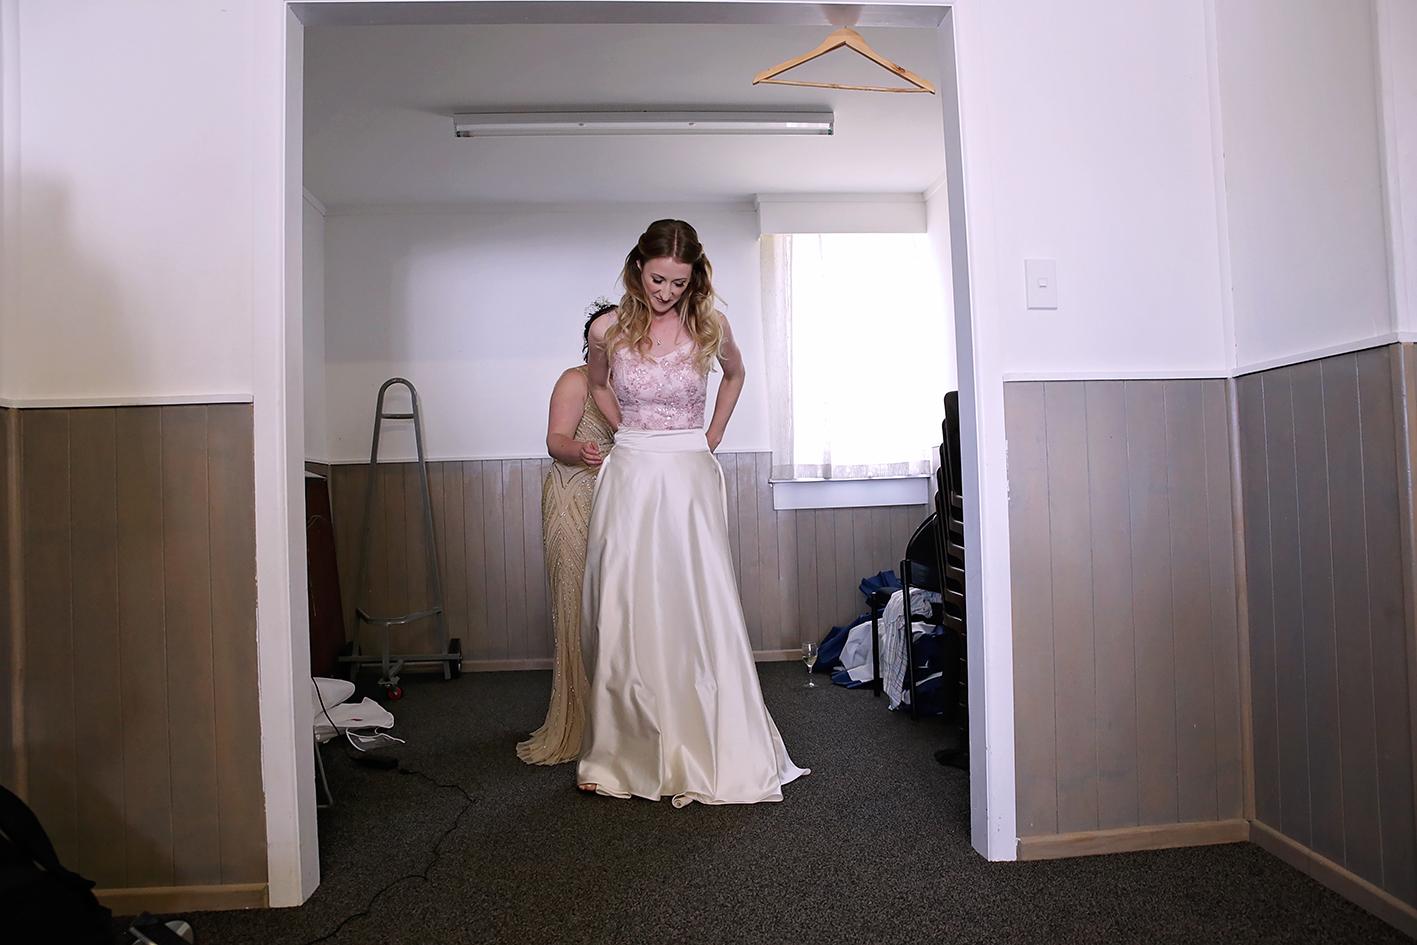 Elizabeth_May_Bridal_Wedding Photos - Brightlights 161.jpg